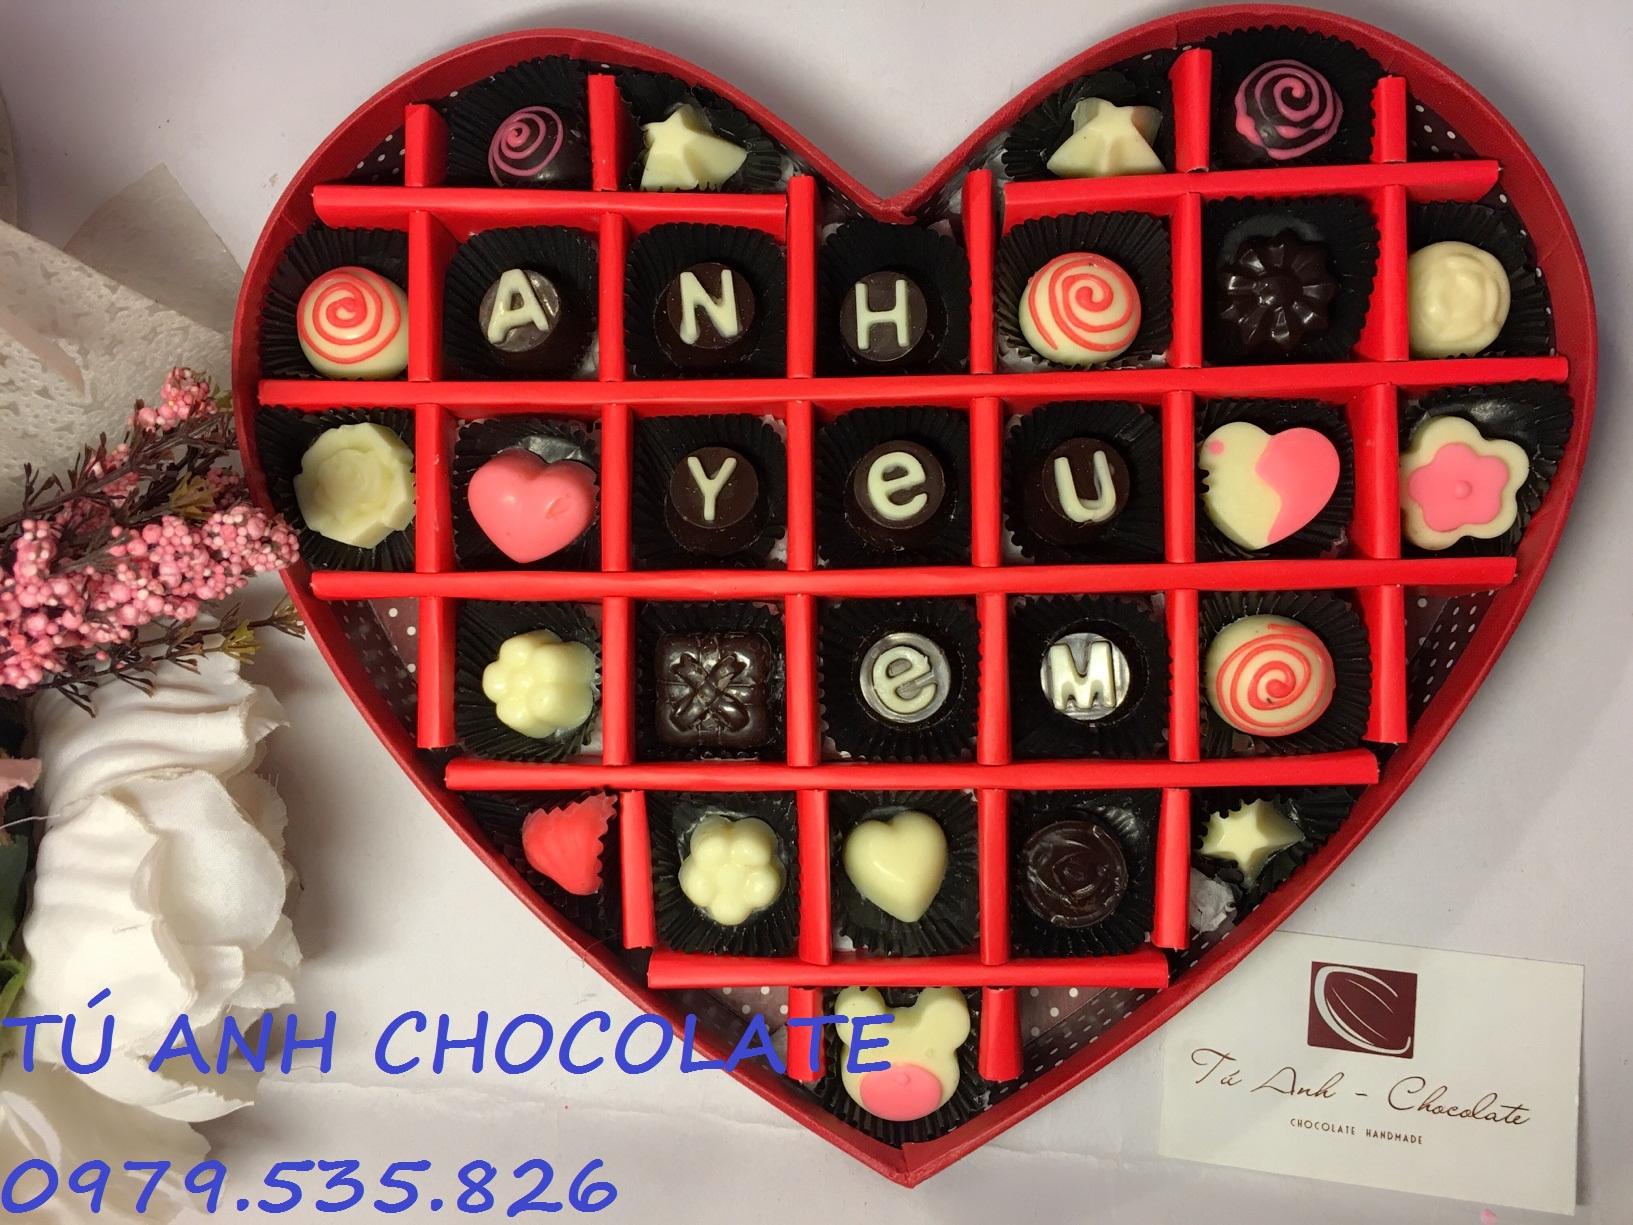 Socola valentine cực ngon - TÚ ANH CHOCOLATE